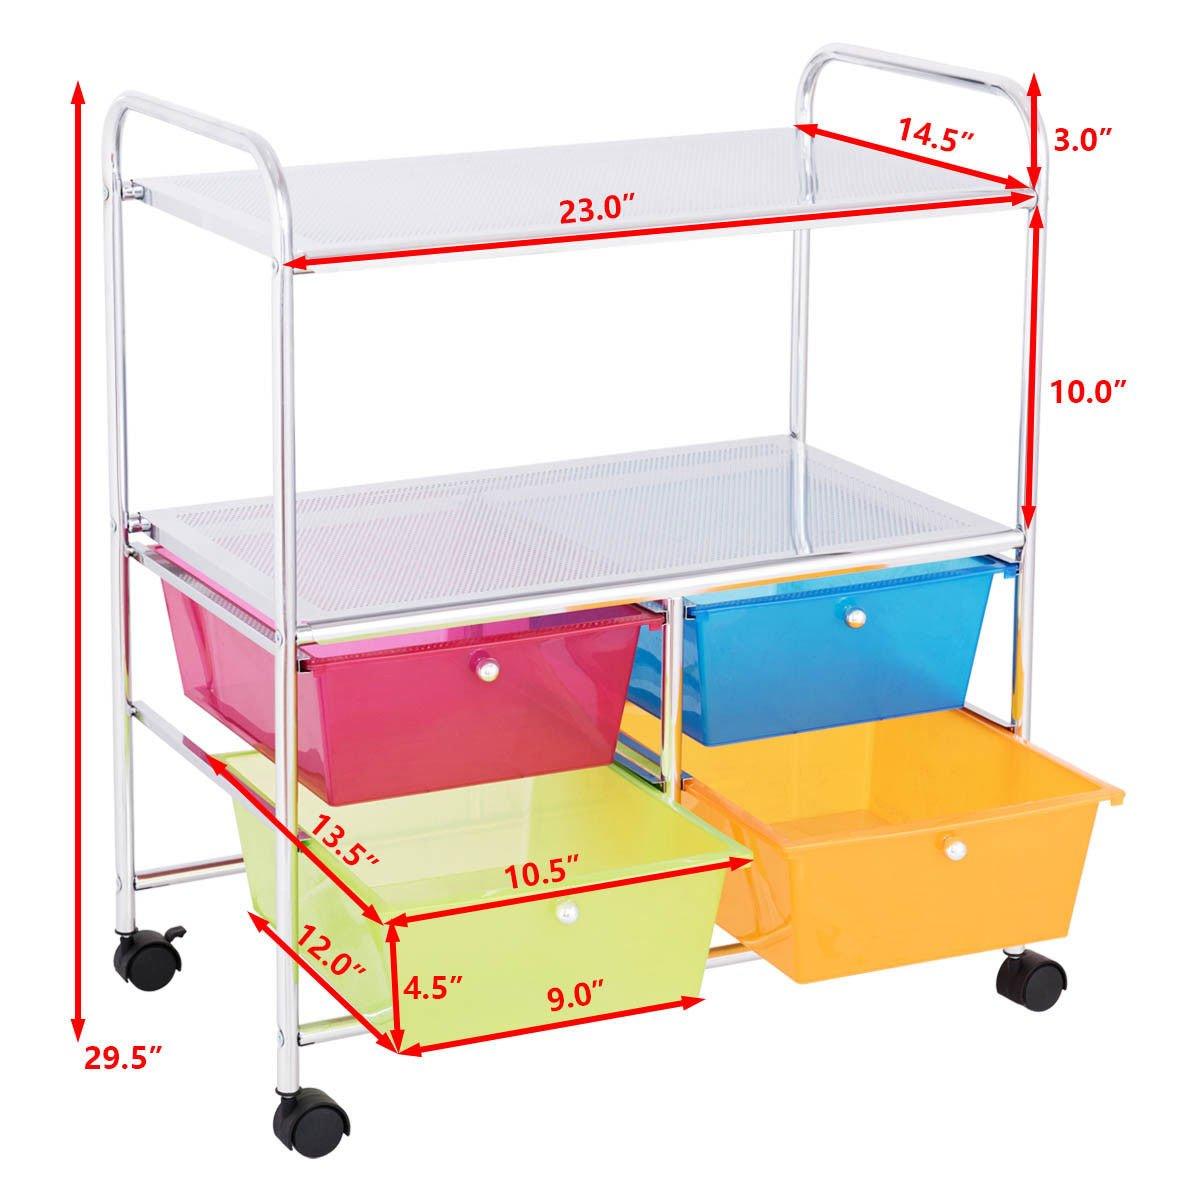 Giantex Rolling Storage Cart w/ 4 Drawers 2 Shelves Metal Rack Shelf Home Office School Beauty Salon Utility Organizer Cart with Wheels (Blue Green Orange & Red) by Giantex (Image #7)